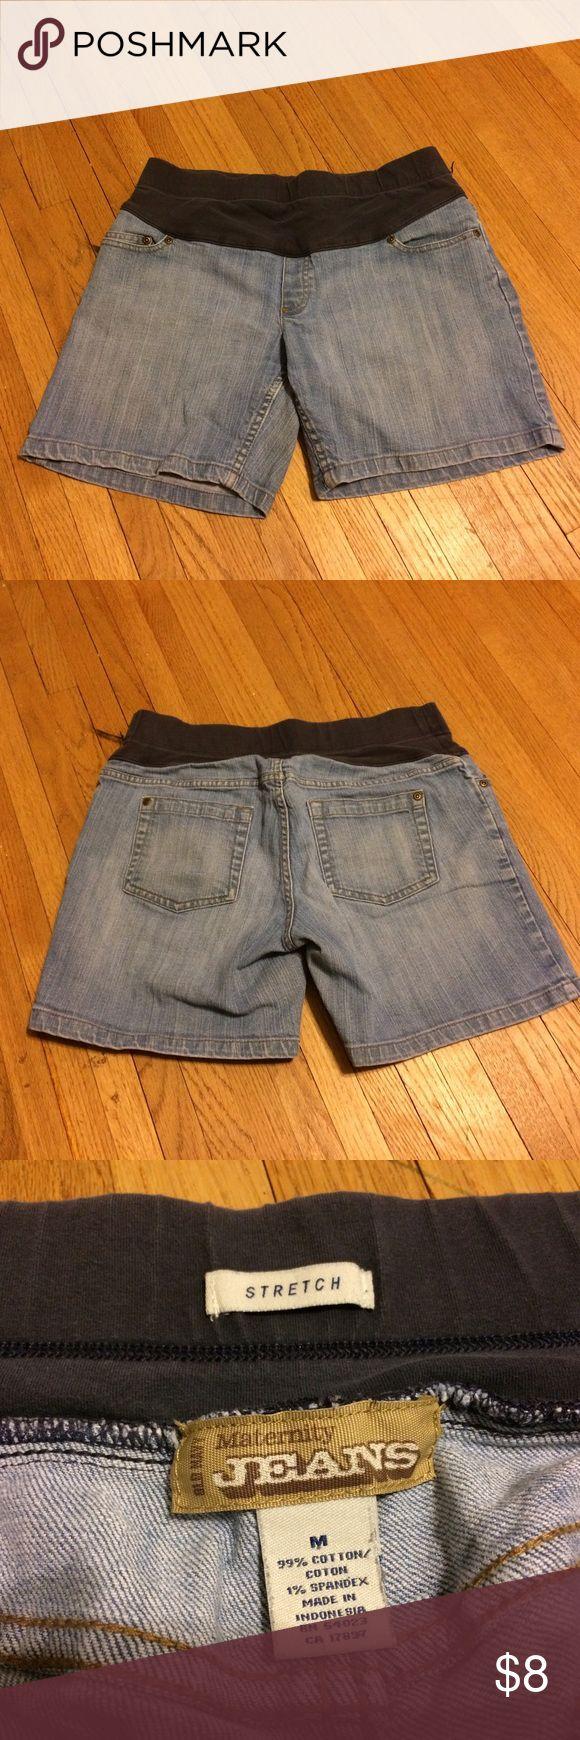 Old Navy maternity jean shorts, medium. Medium Old Navy maternity jean shorts. Good used condition. Smoke free home. Reasonable offers considered, no trades. Old Navy Shorts Jean Shorts